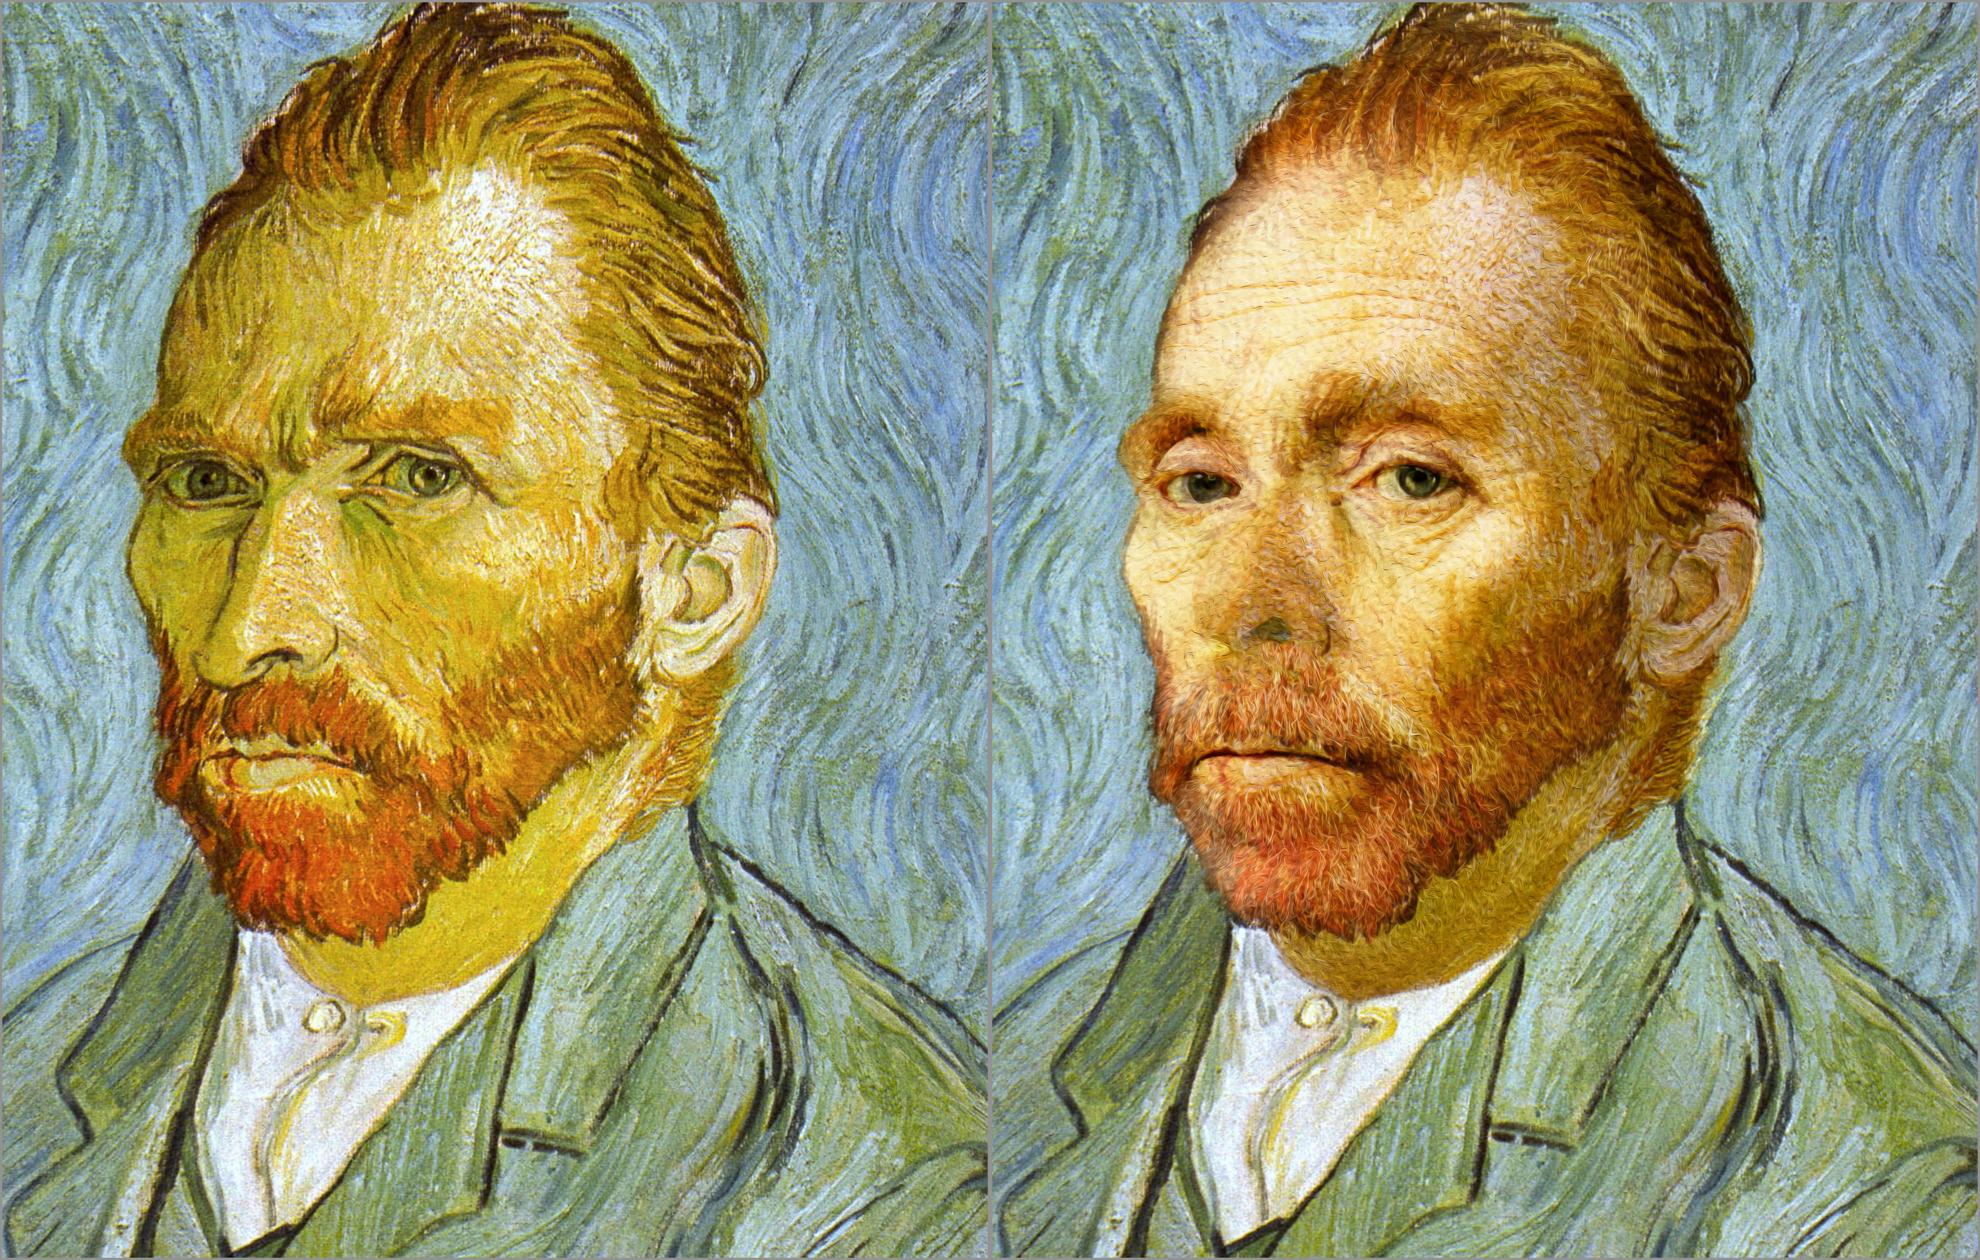 Van Gogh, self portrait, 1889, Chris Golson-